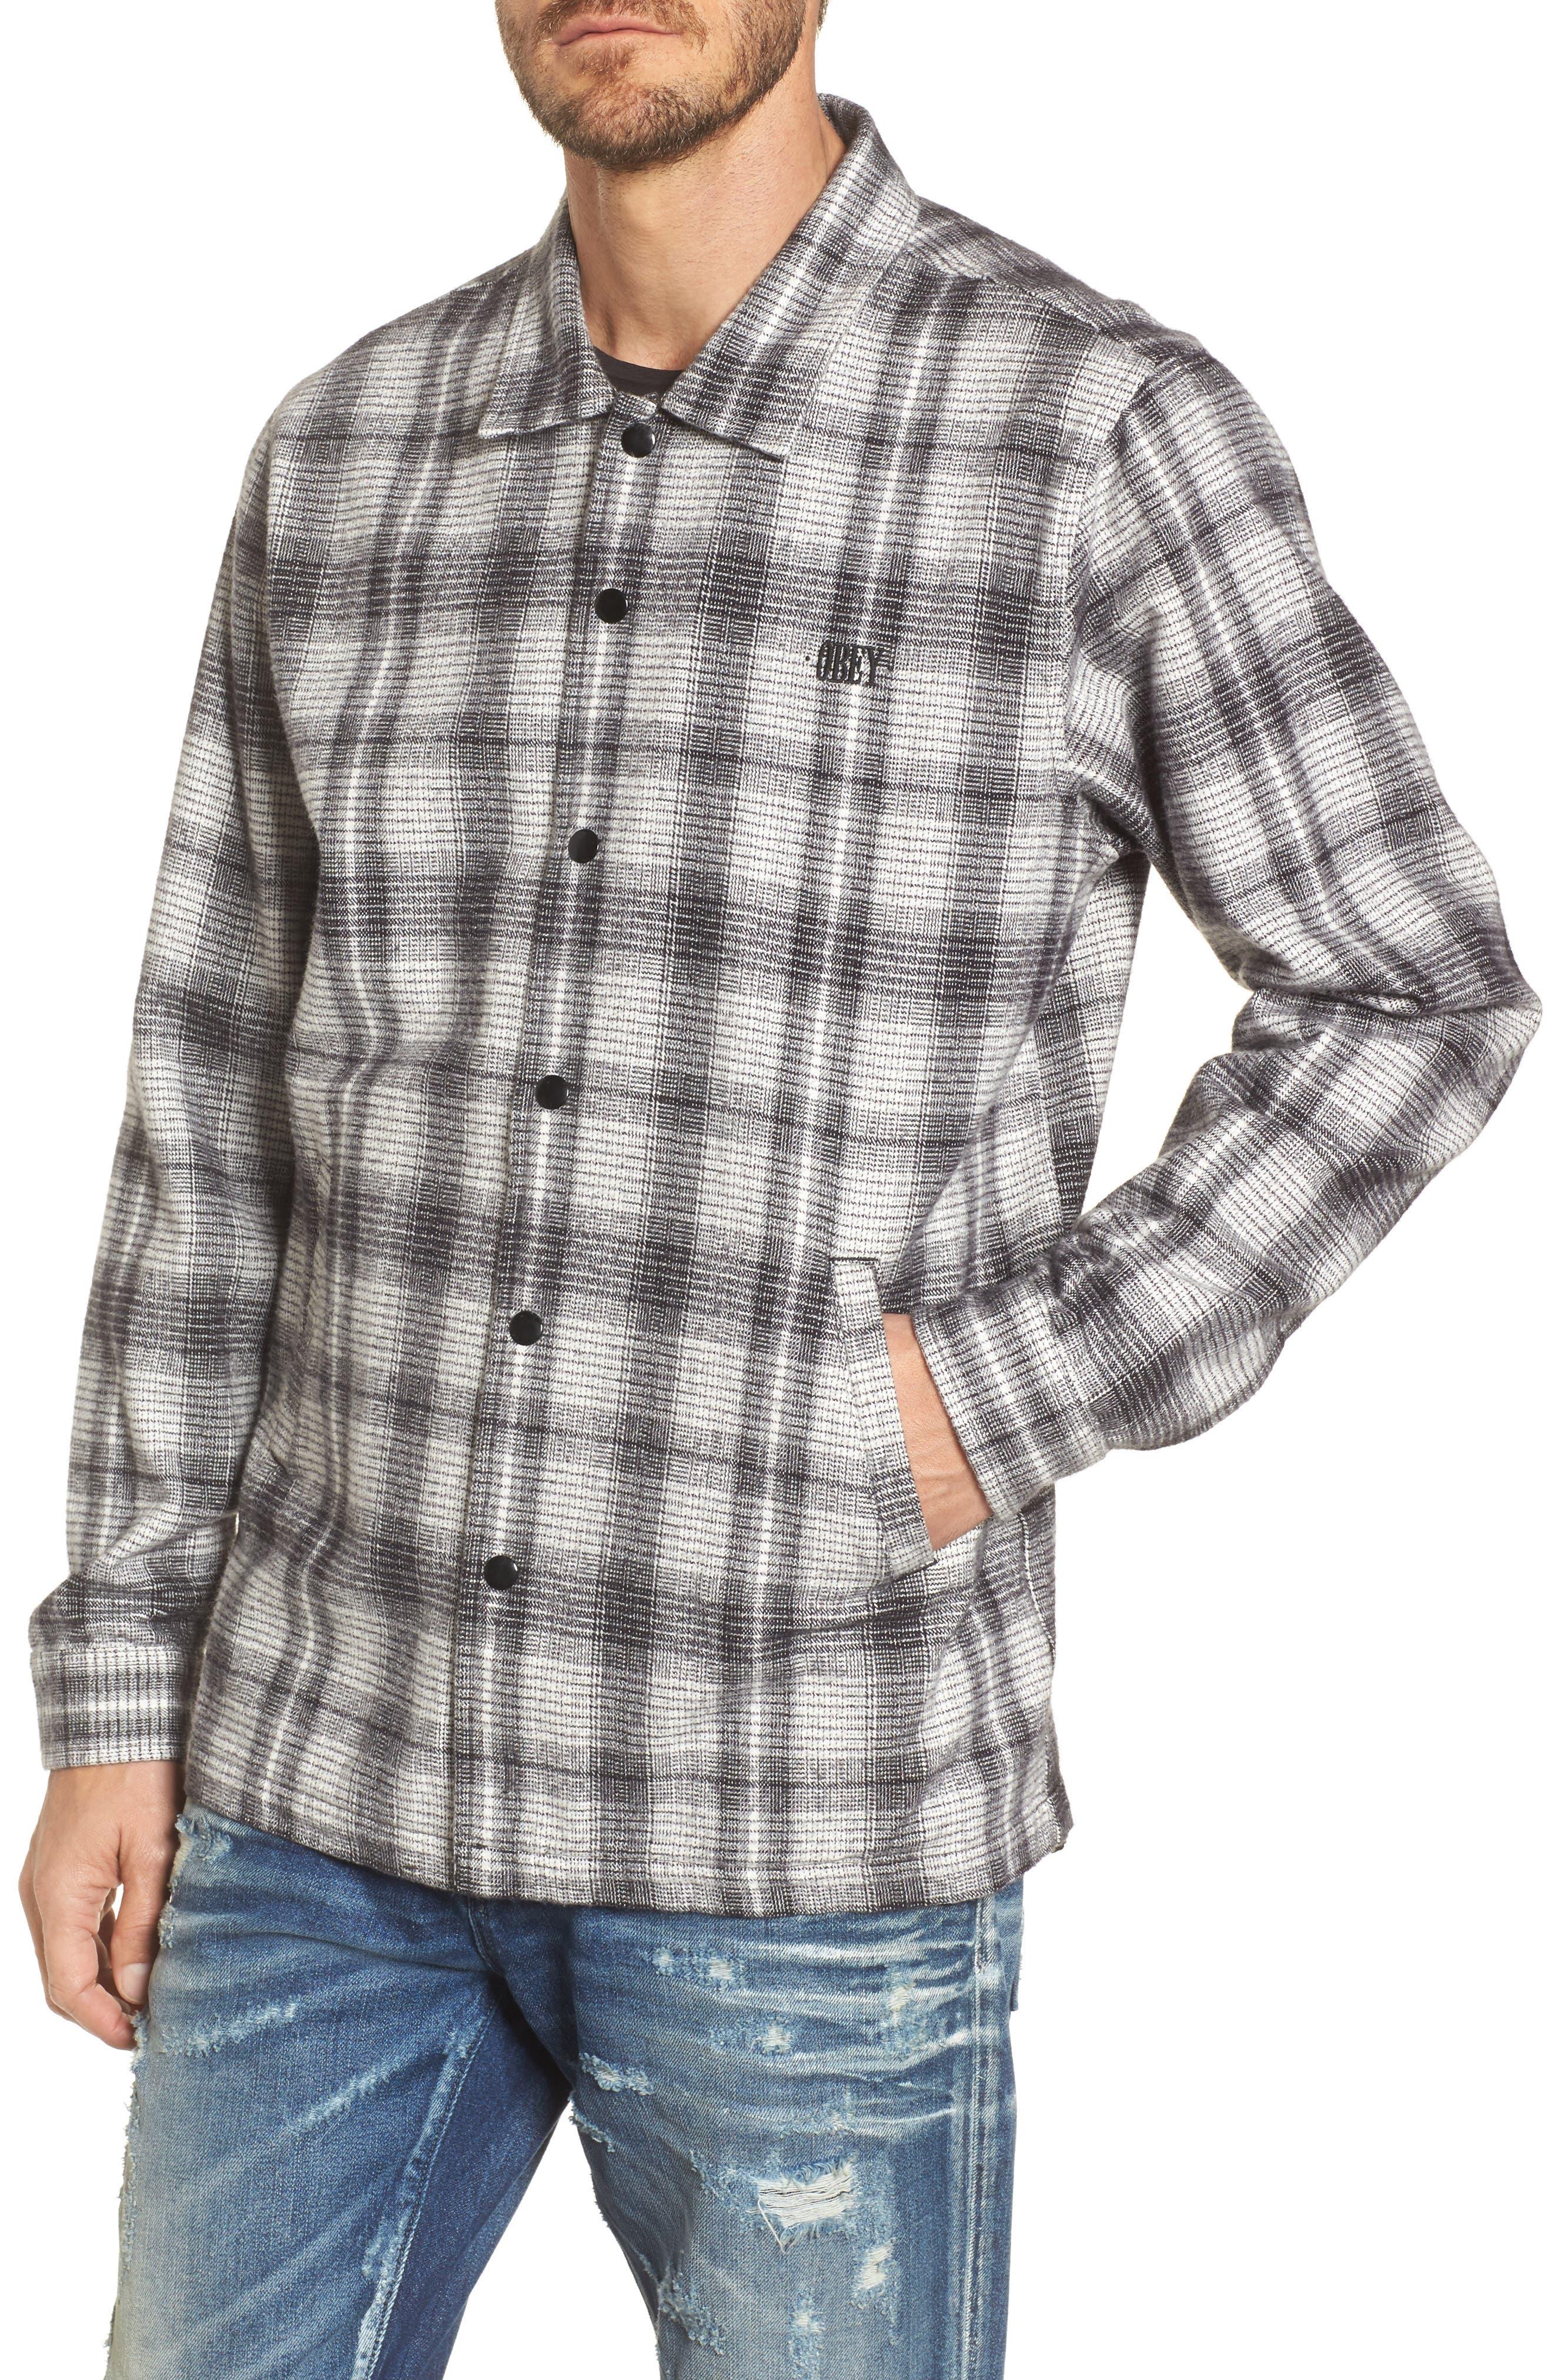 Whittier Plaid Flannel Shirt Jacket,                             Alternate thumbnail 4, color,                             Neutral Grey Multi